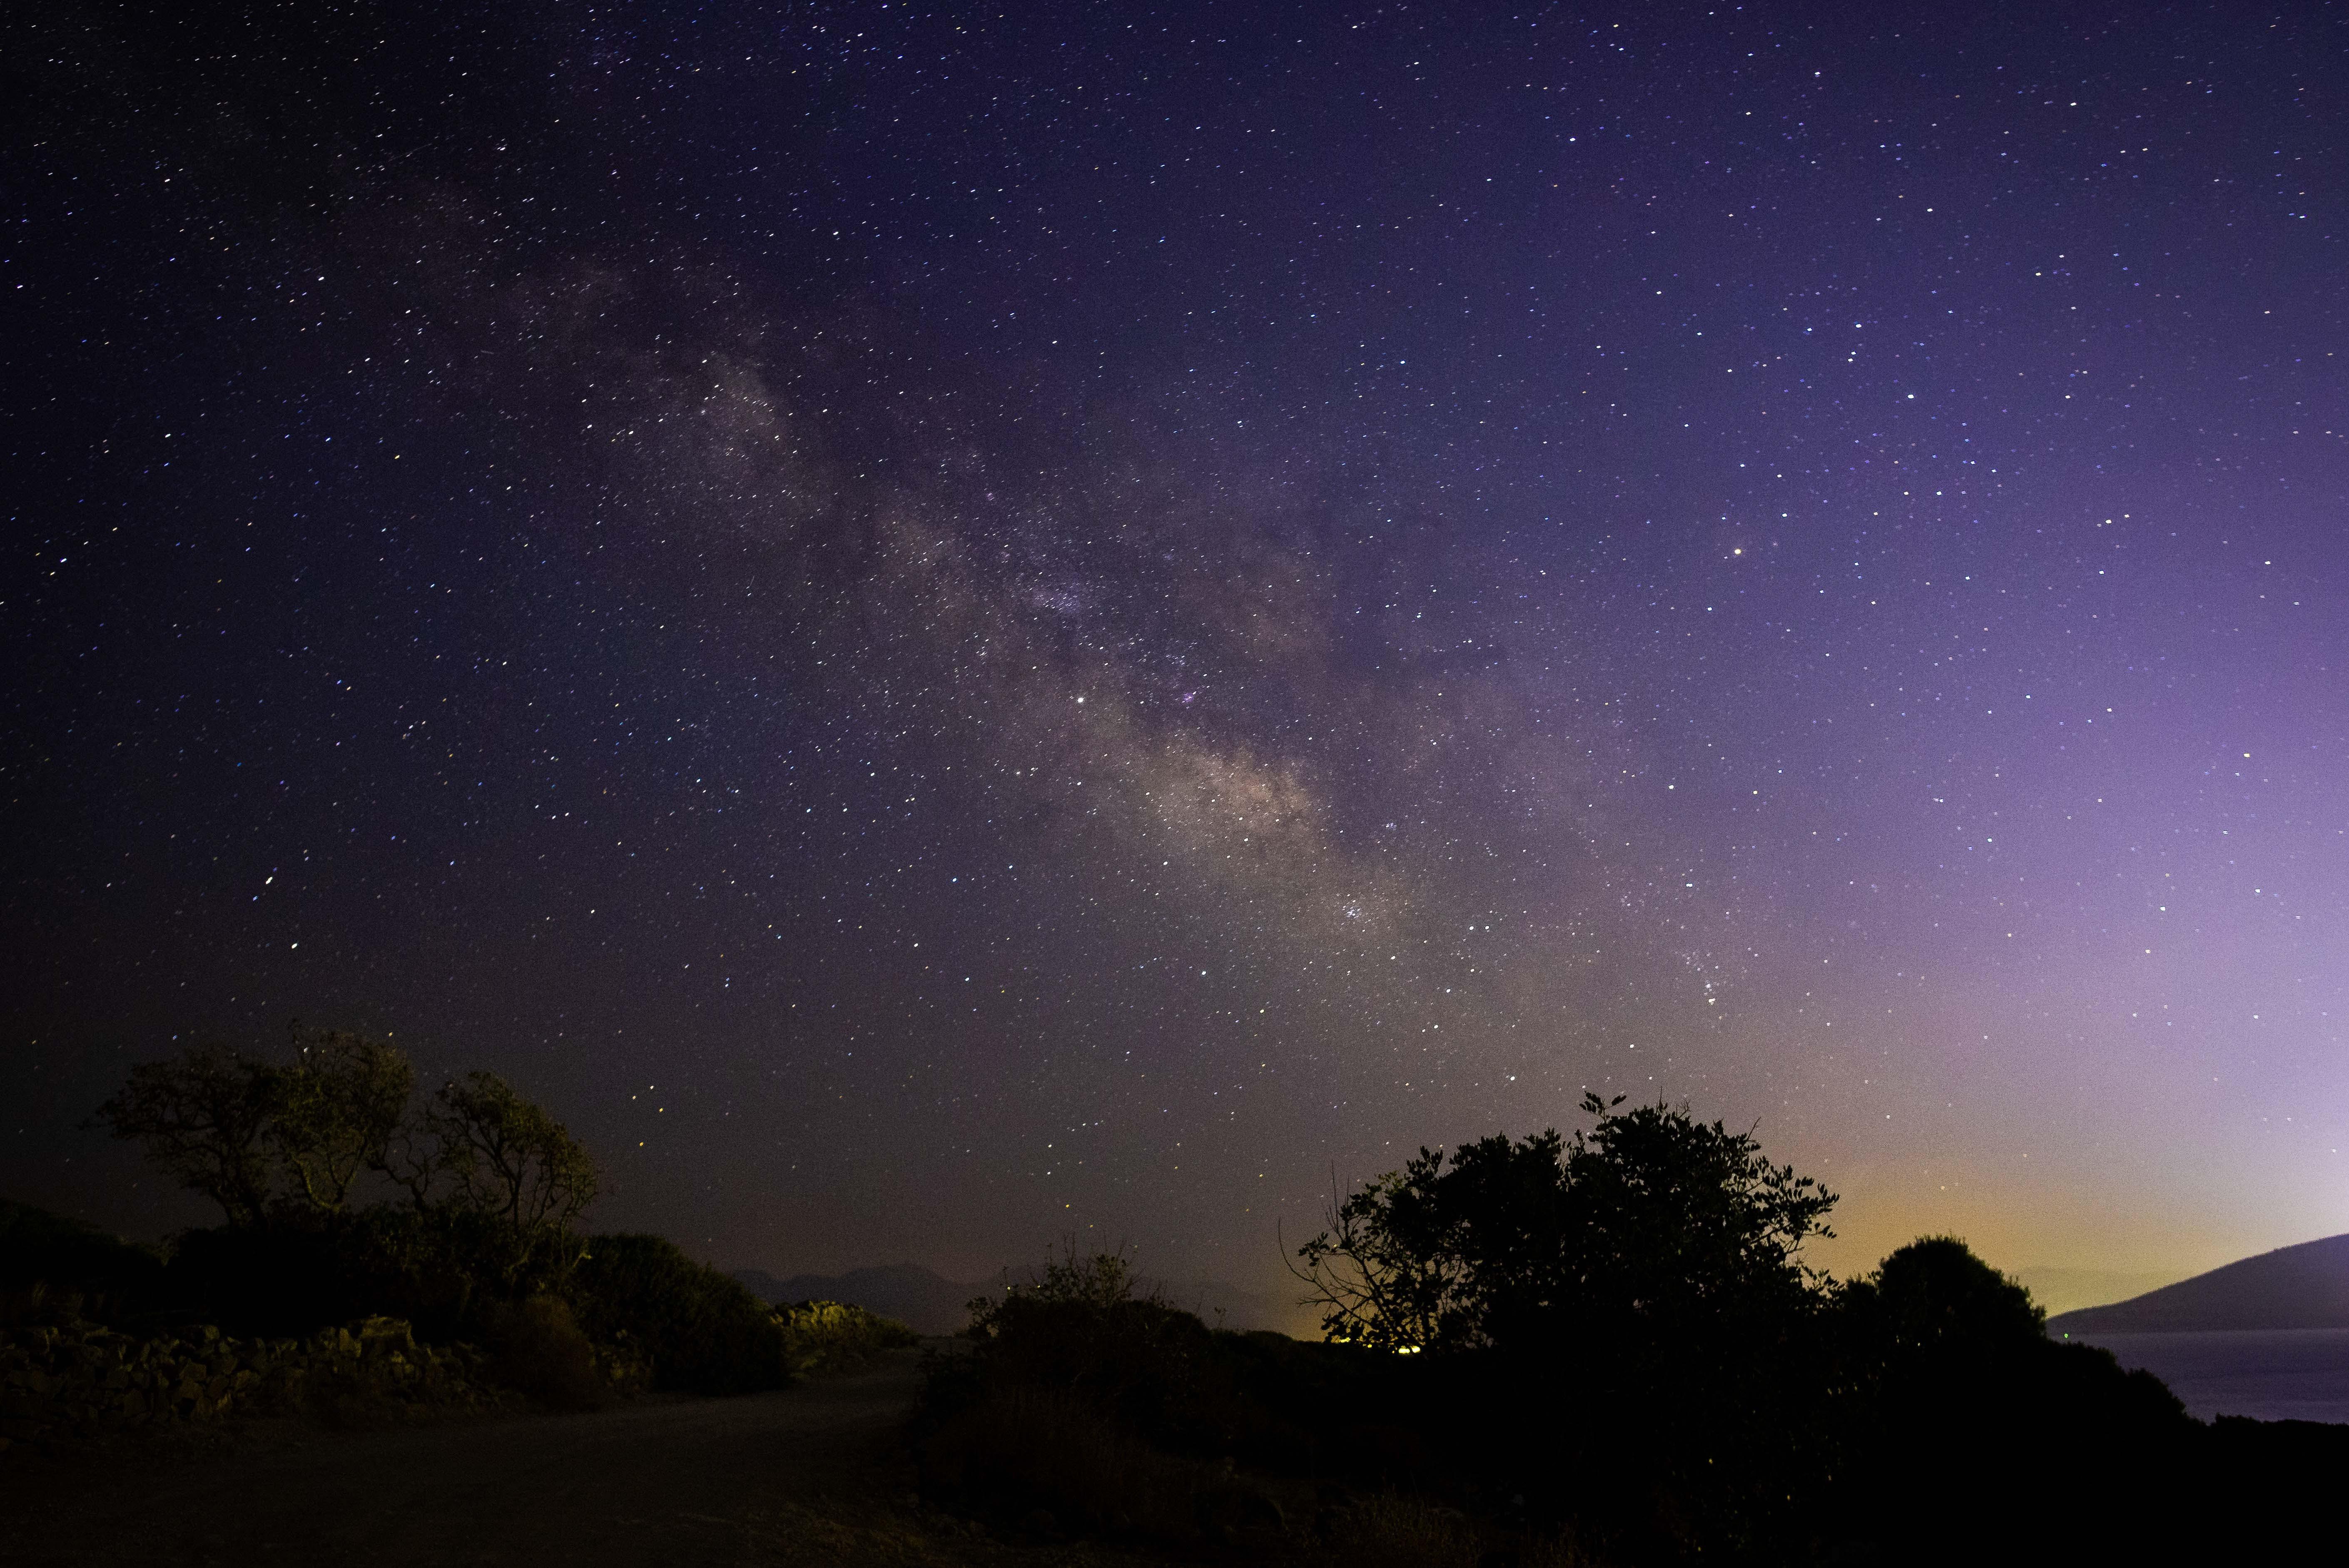 Silhouette of Tree Under Nebula